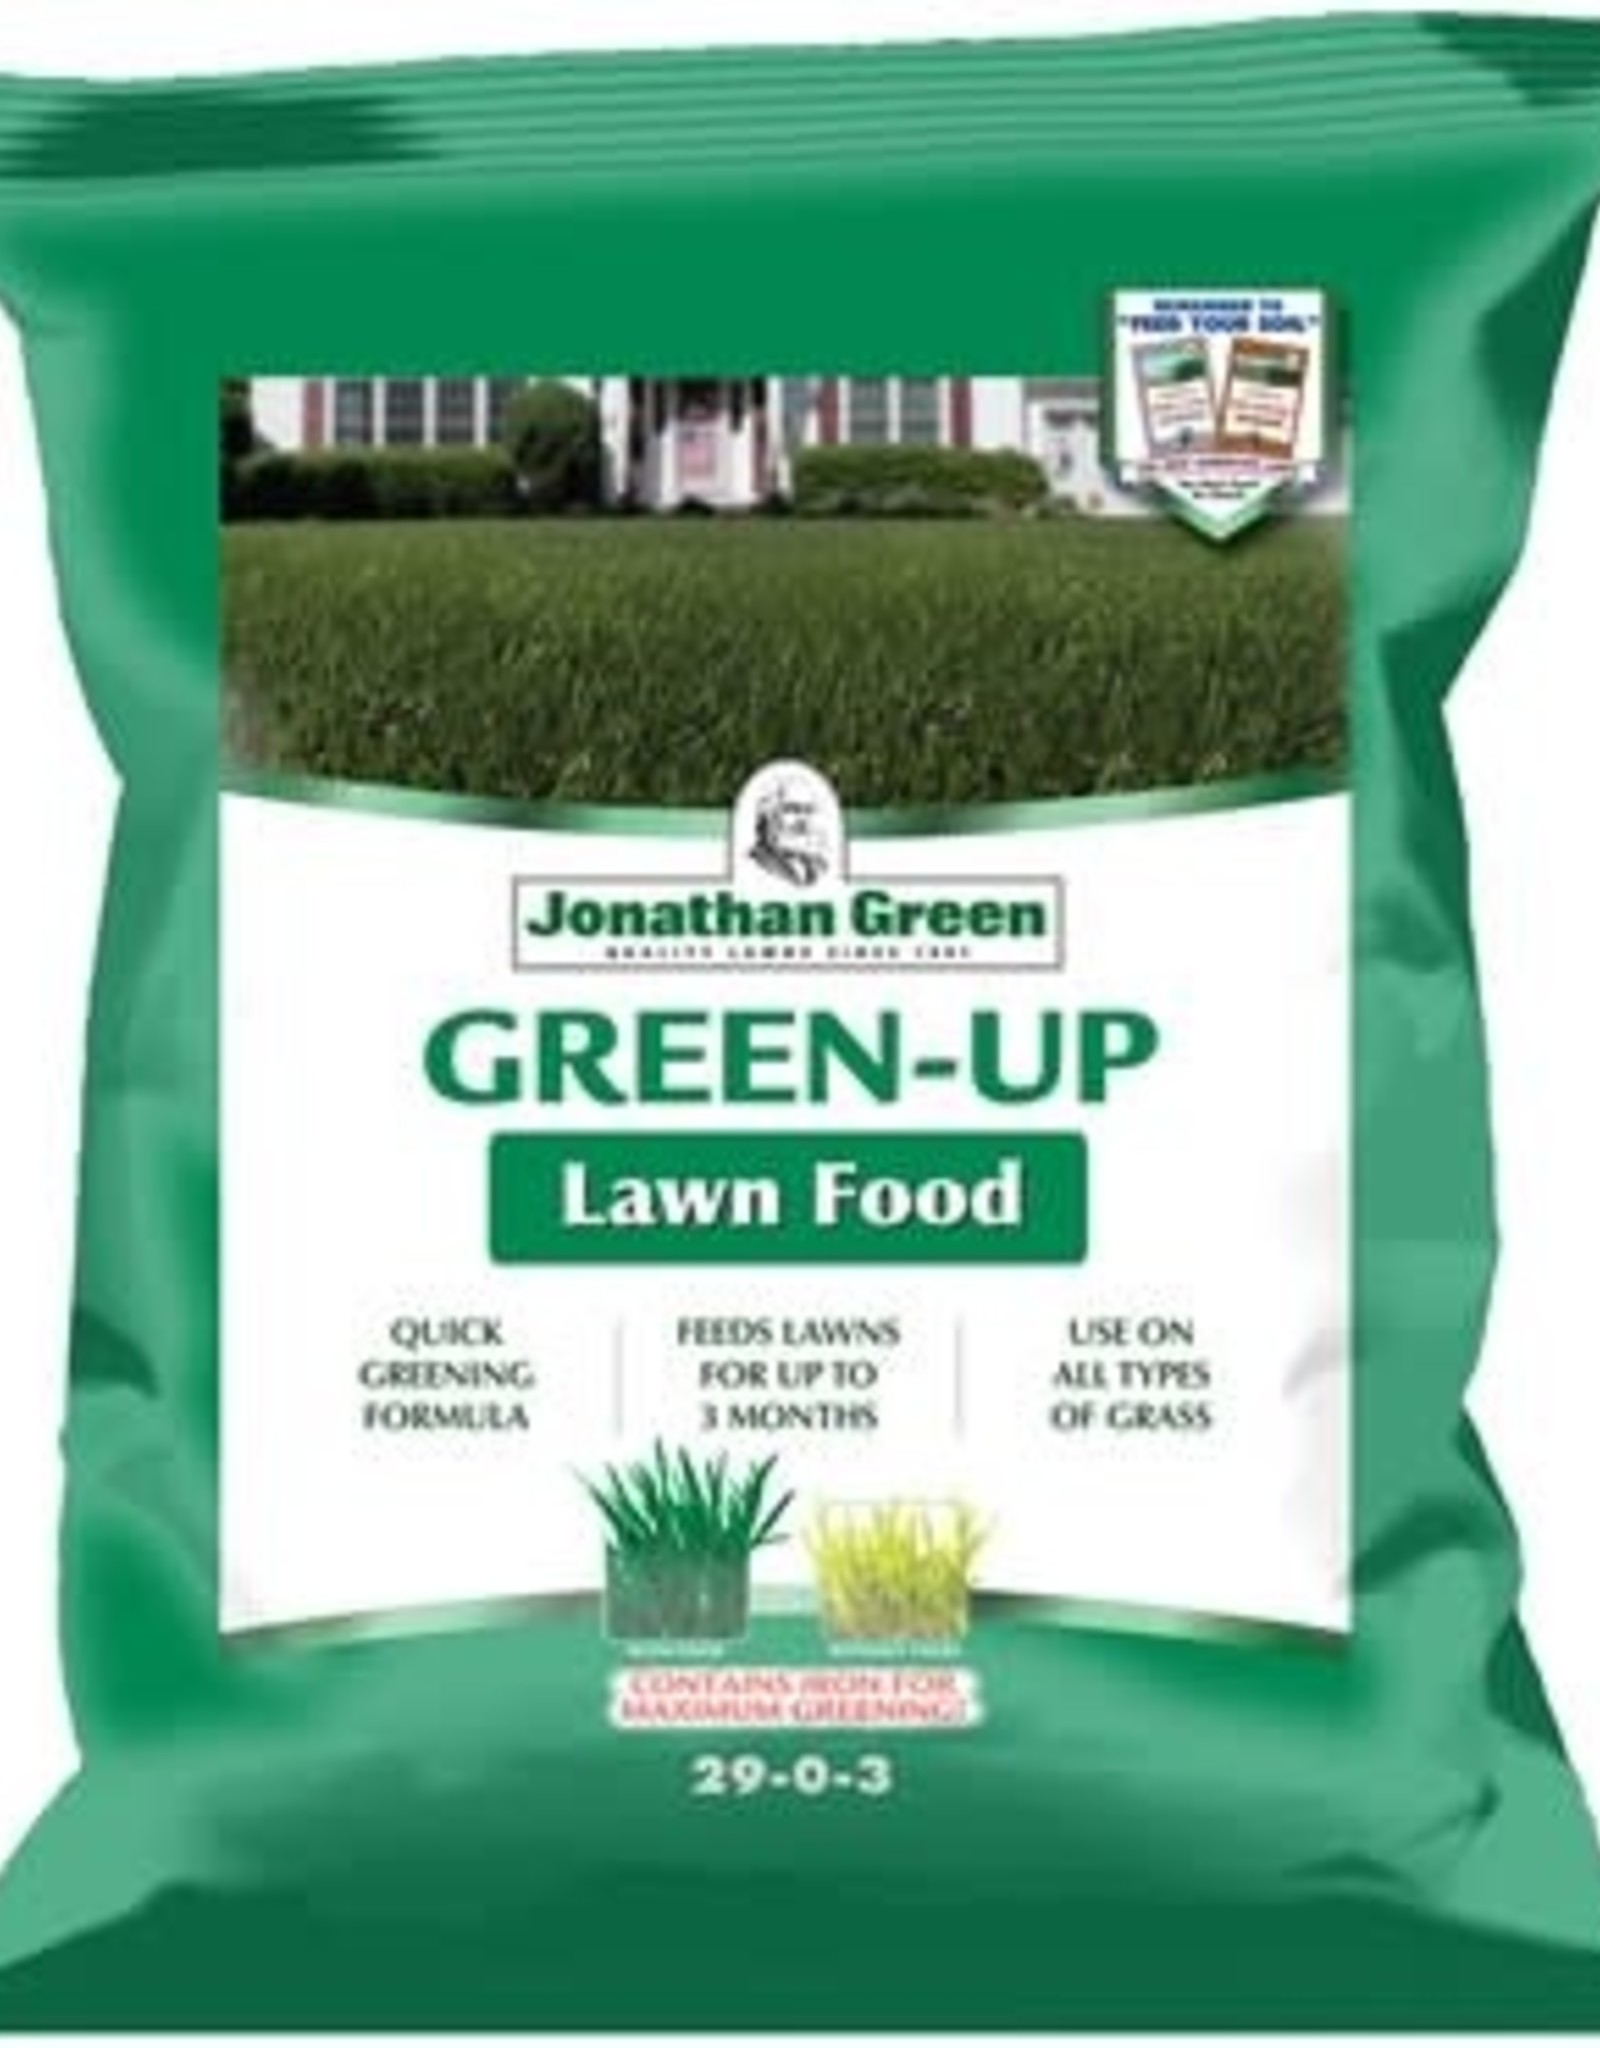 Jonathan Green Green-Up Lawn Food